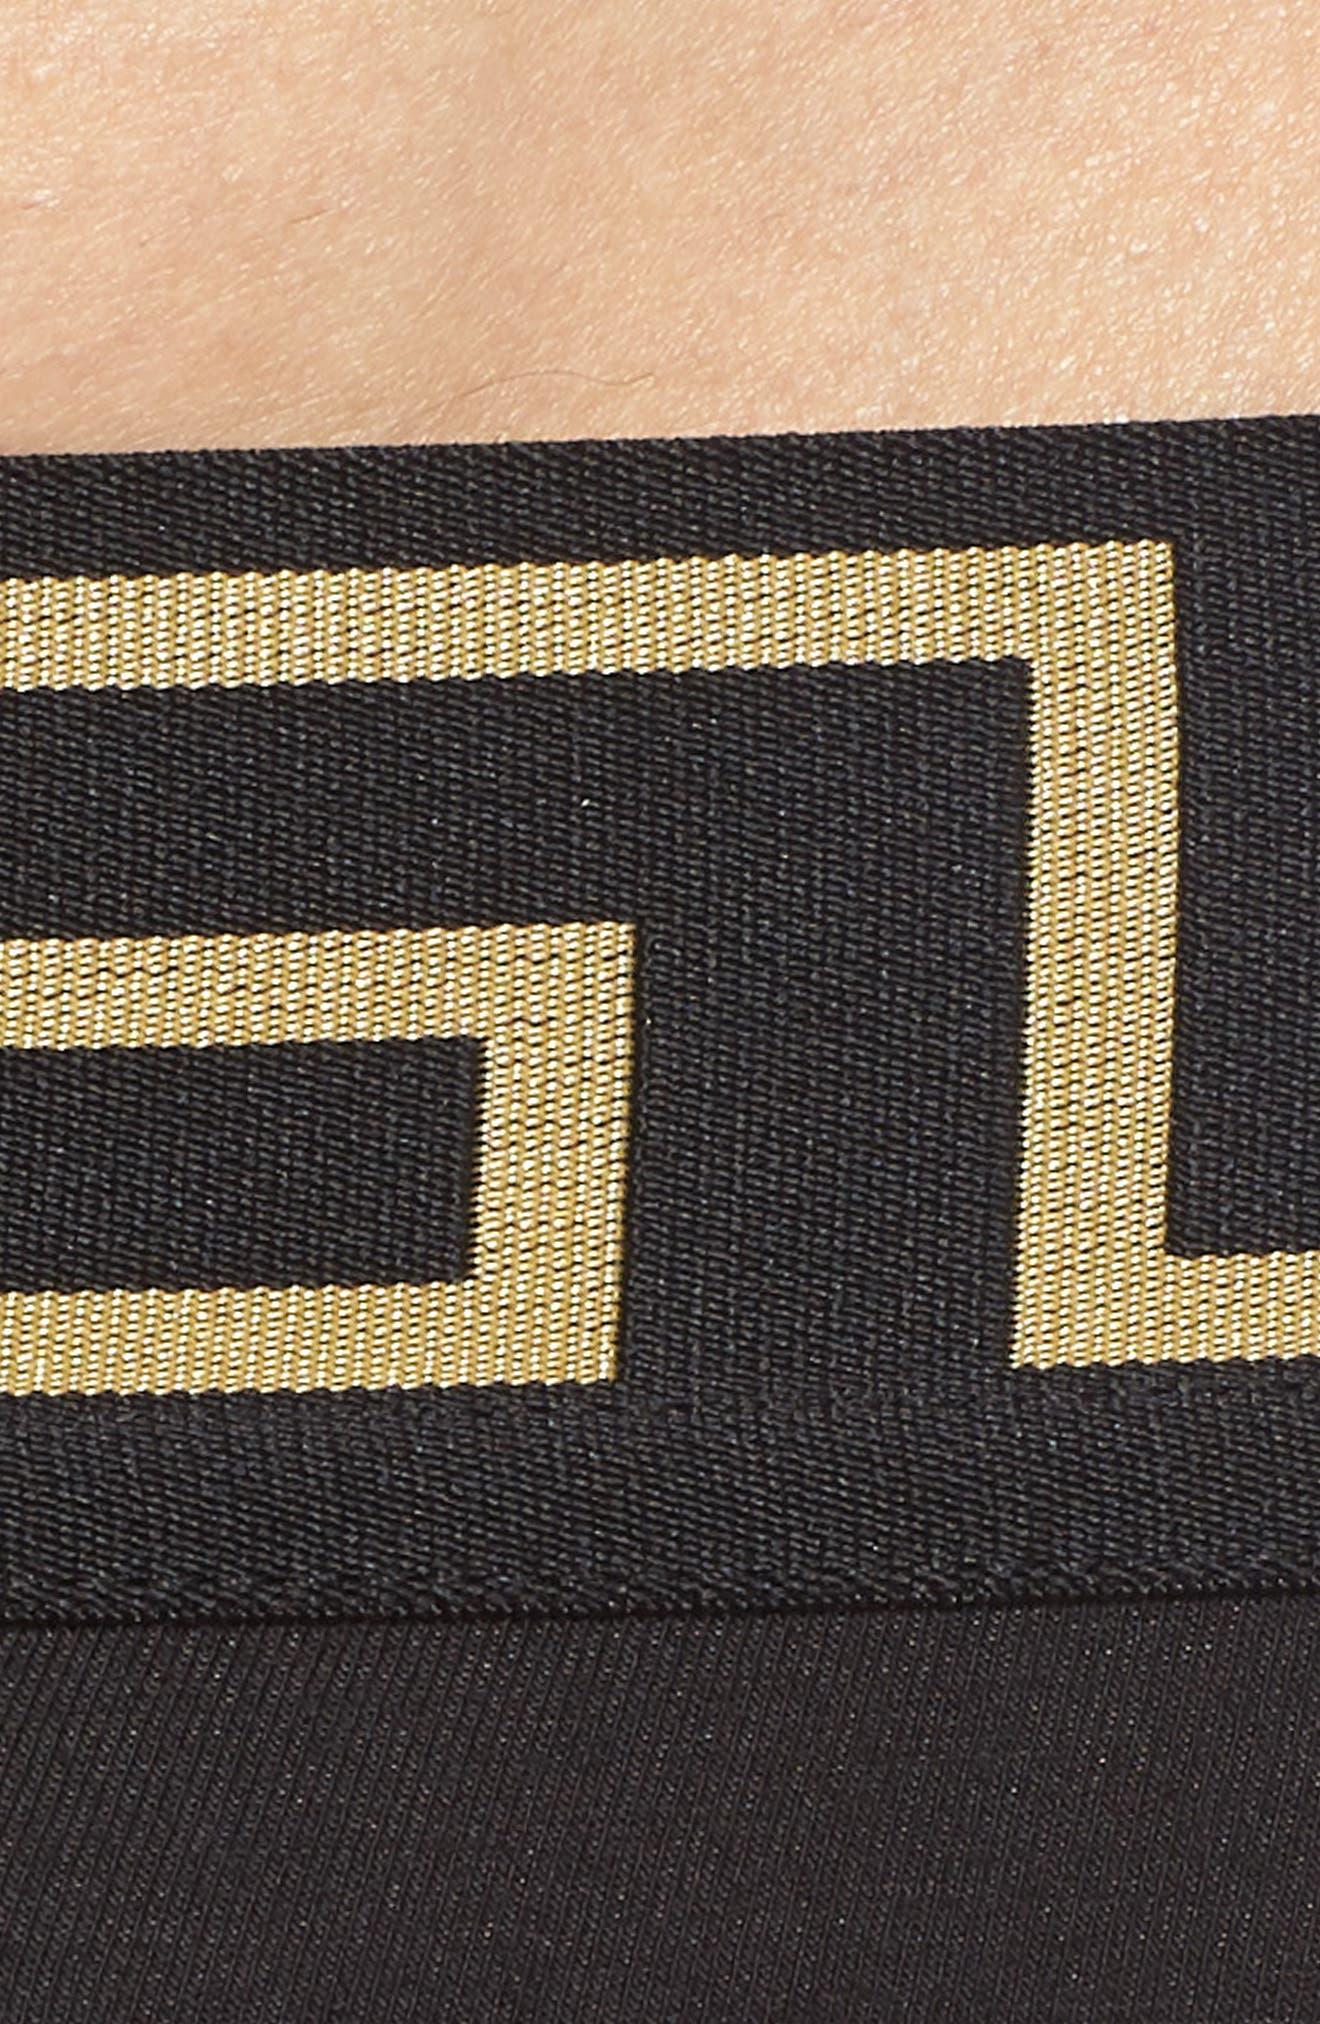 VERSACE, Cotton Thong, Alternate thumbnail 3, color, BLACK/ GOLD